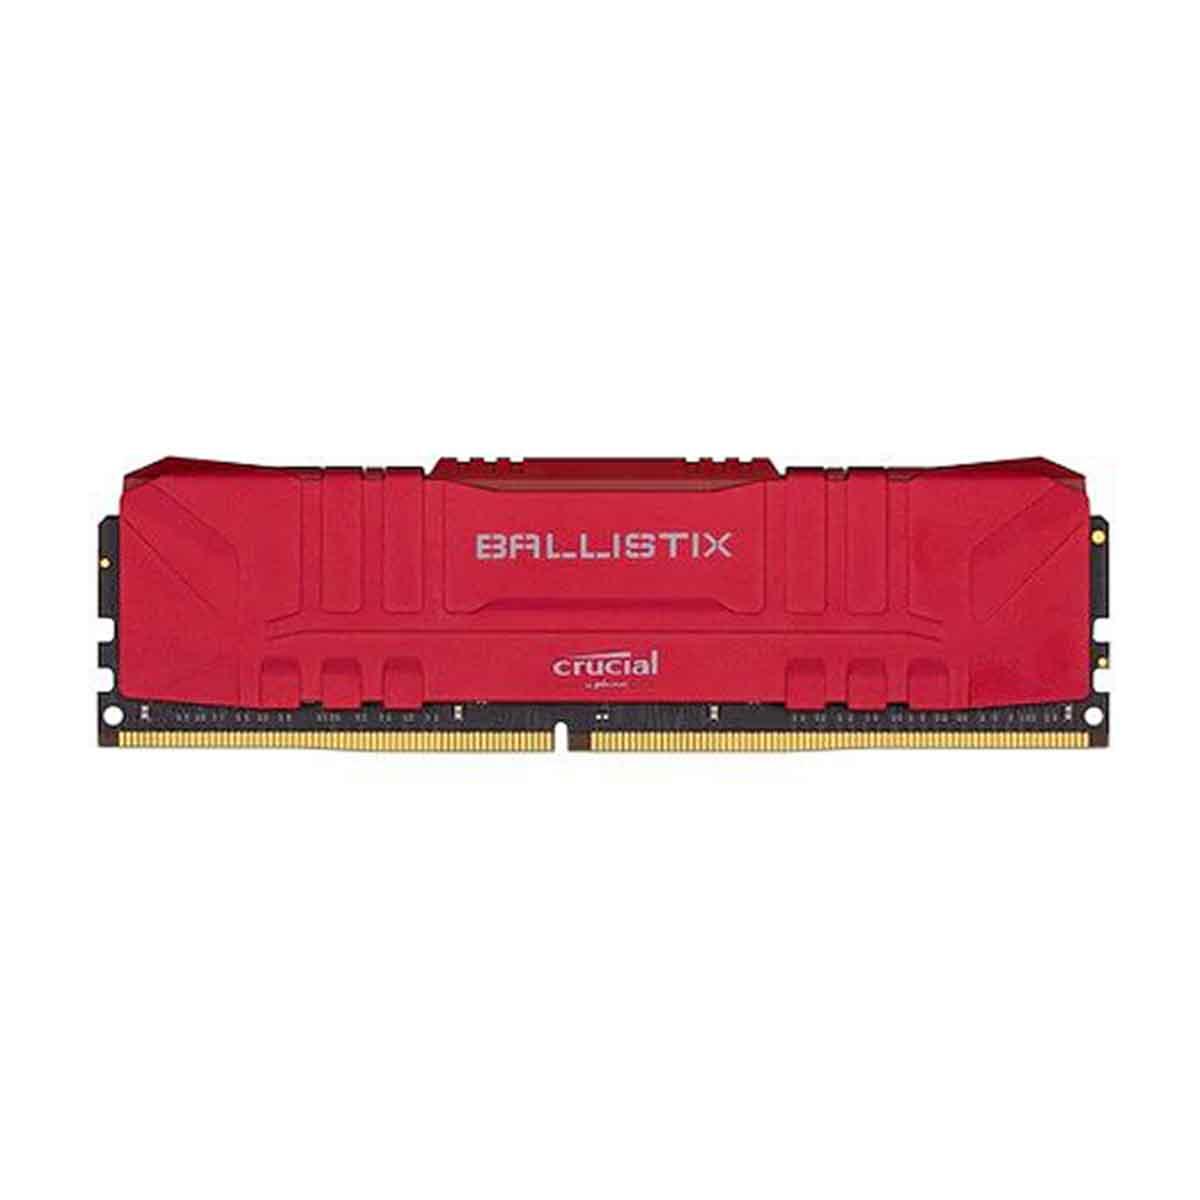 CRUCIAL BALLISTIX  MEMORIA GAMMER 8GB DDR4-2666 ROJA BL8G26C16U4R